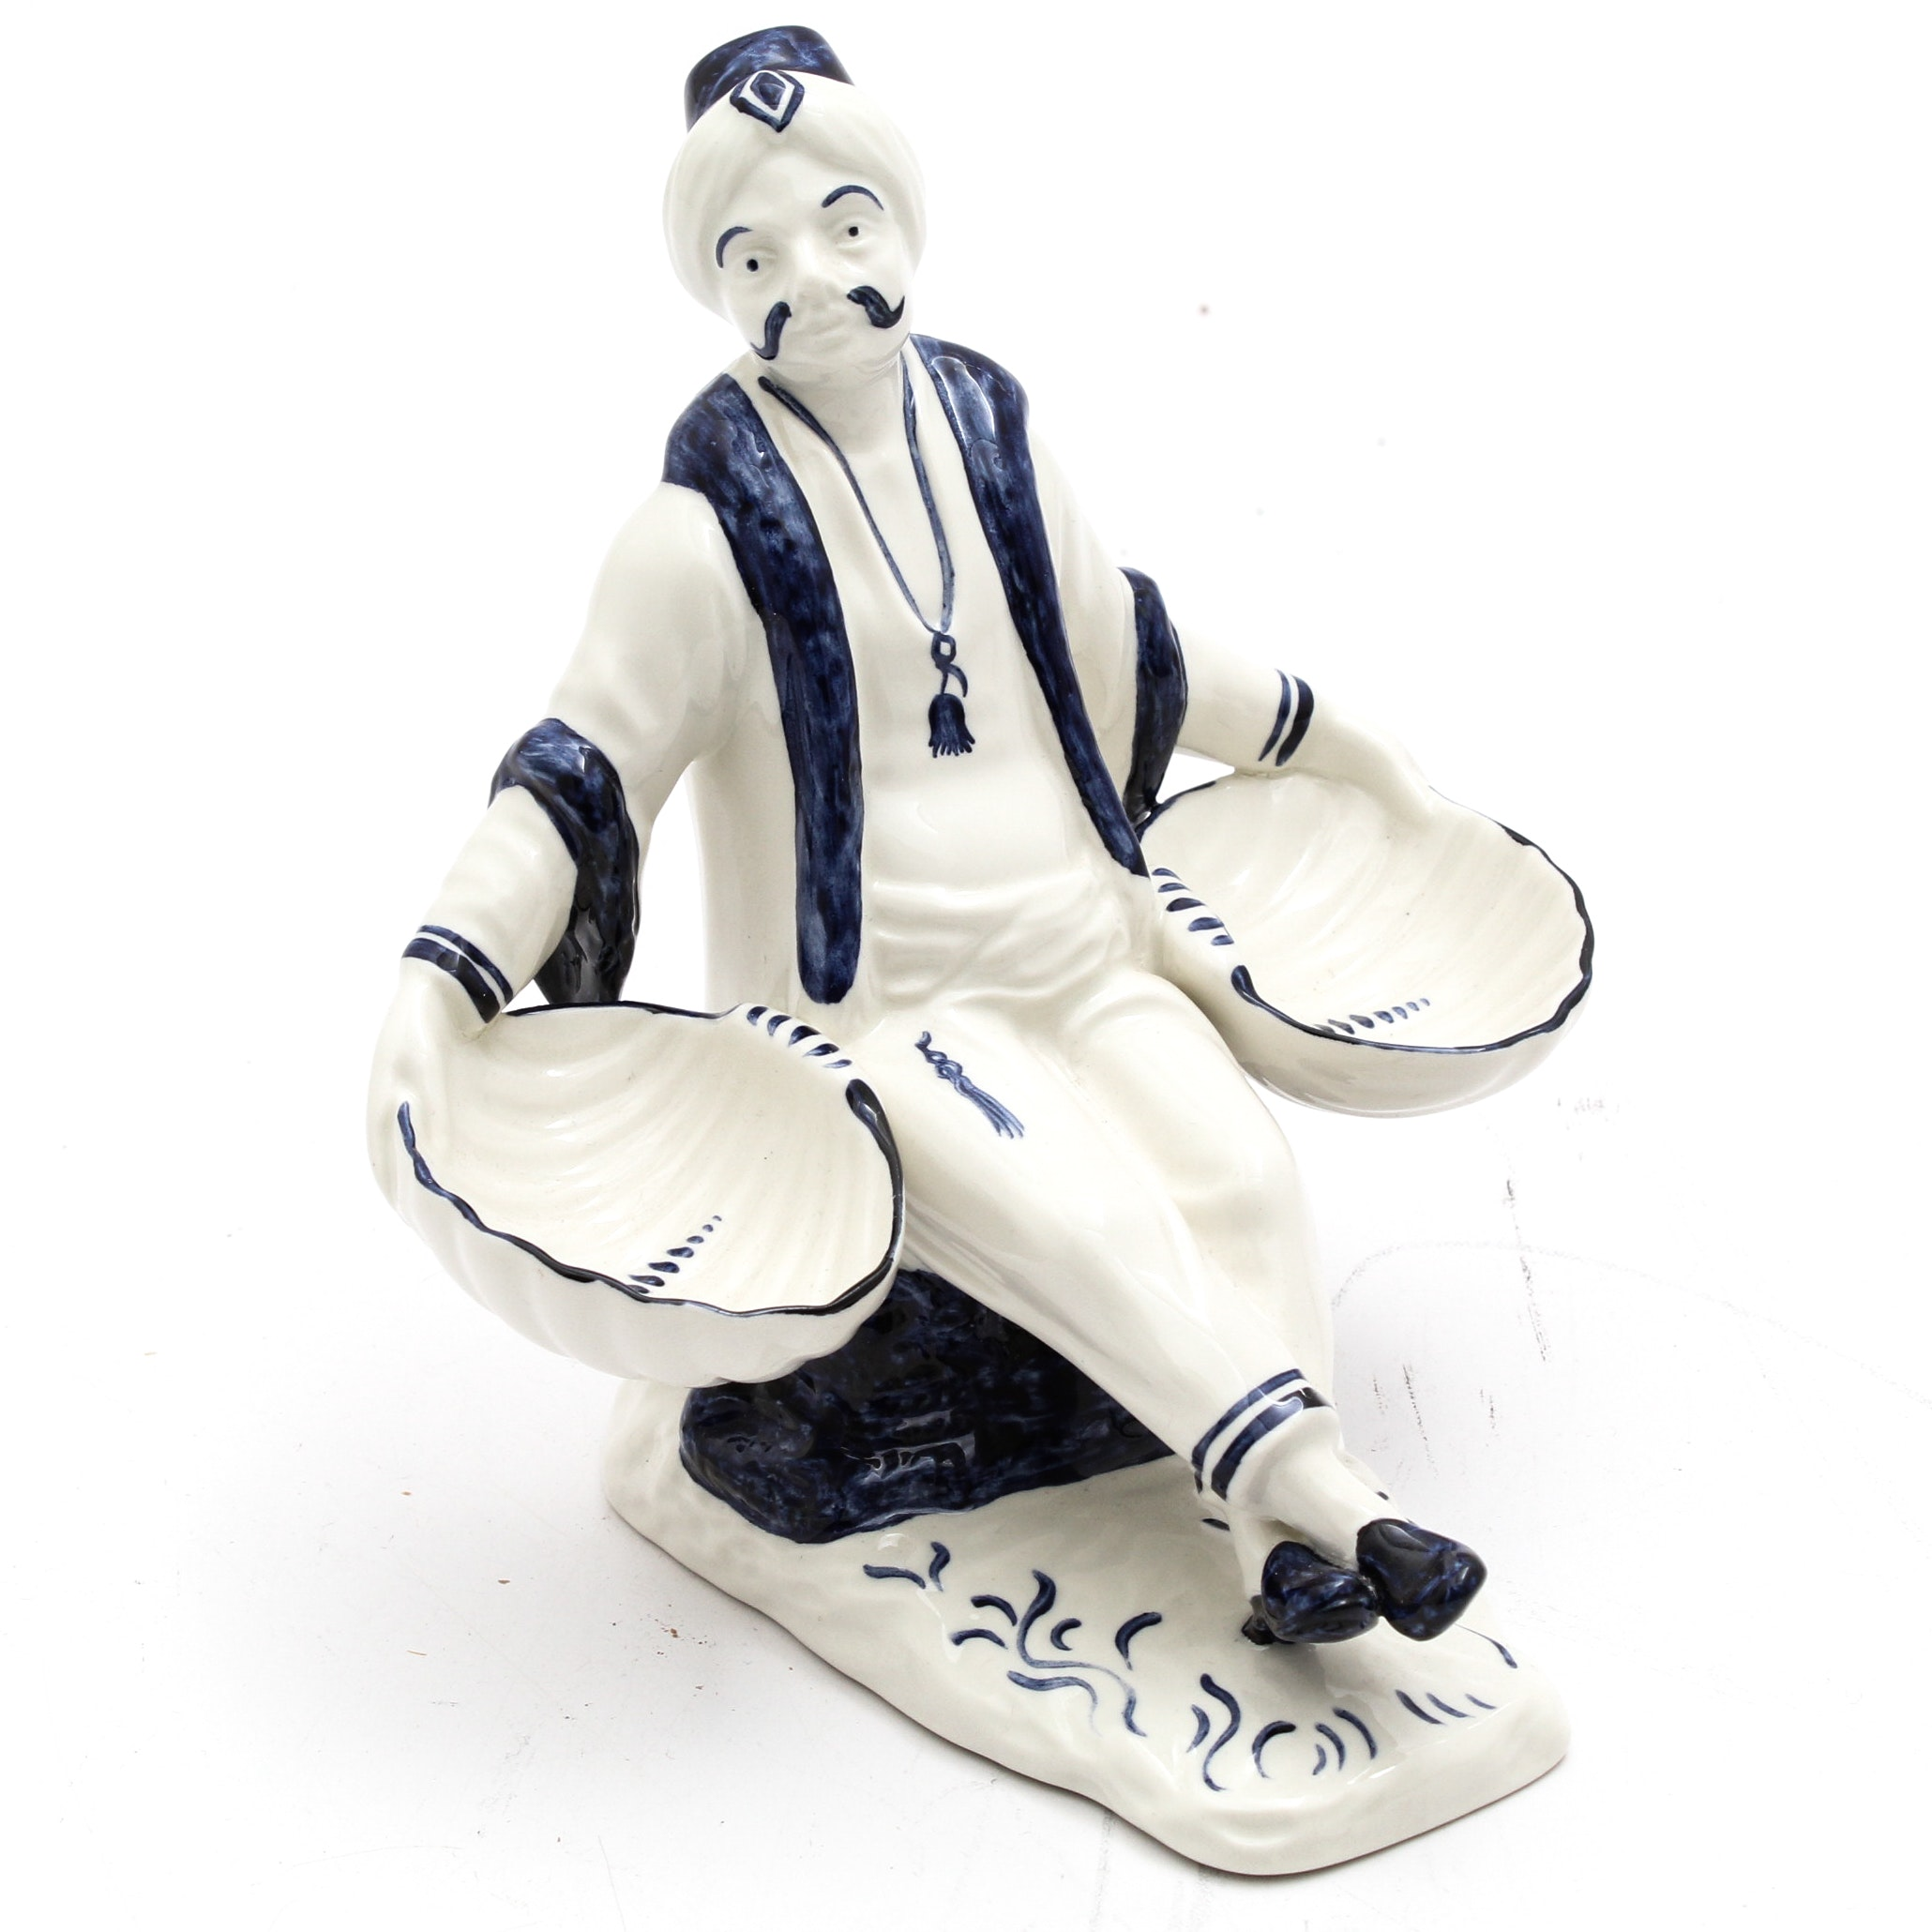 Villeroy & Boch Porcelain Double Salt Cellar